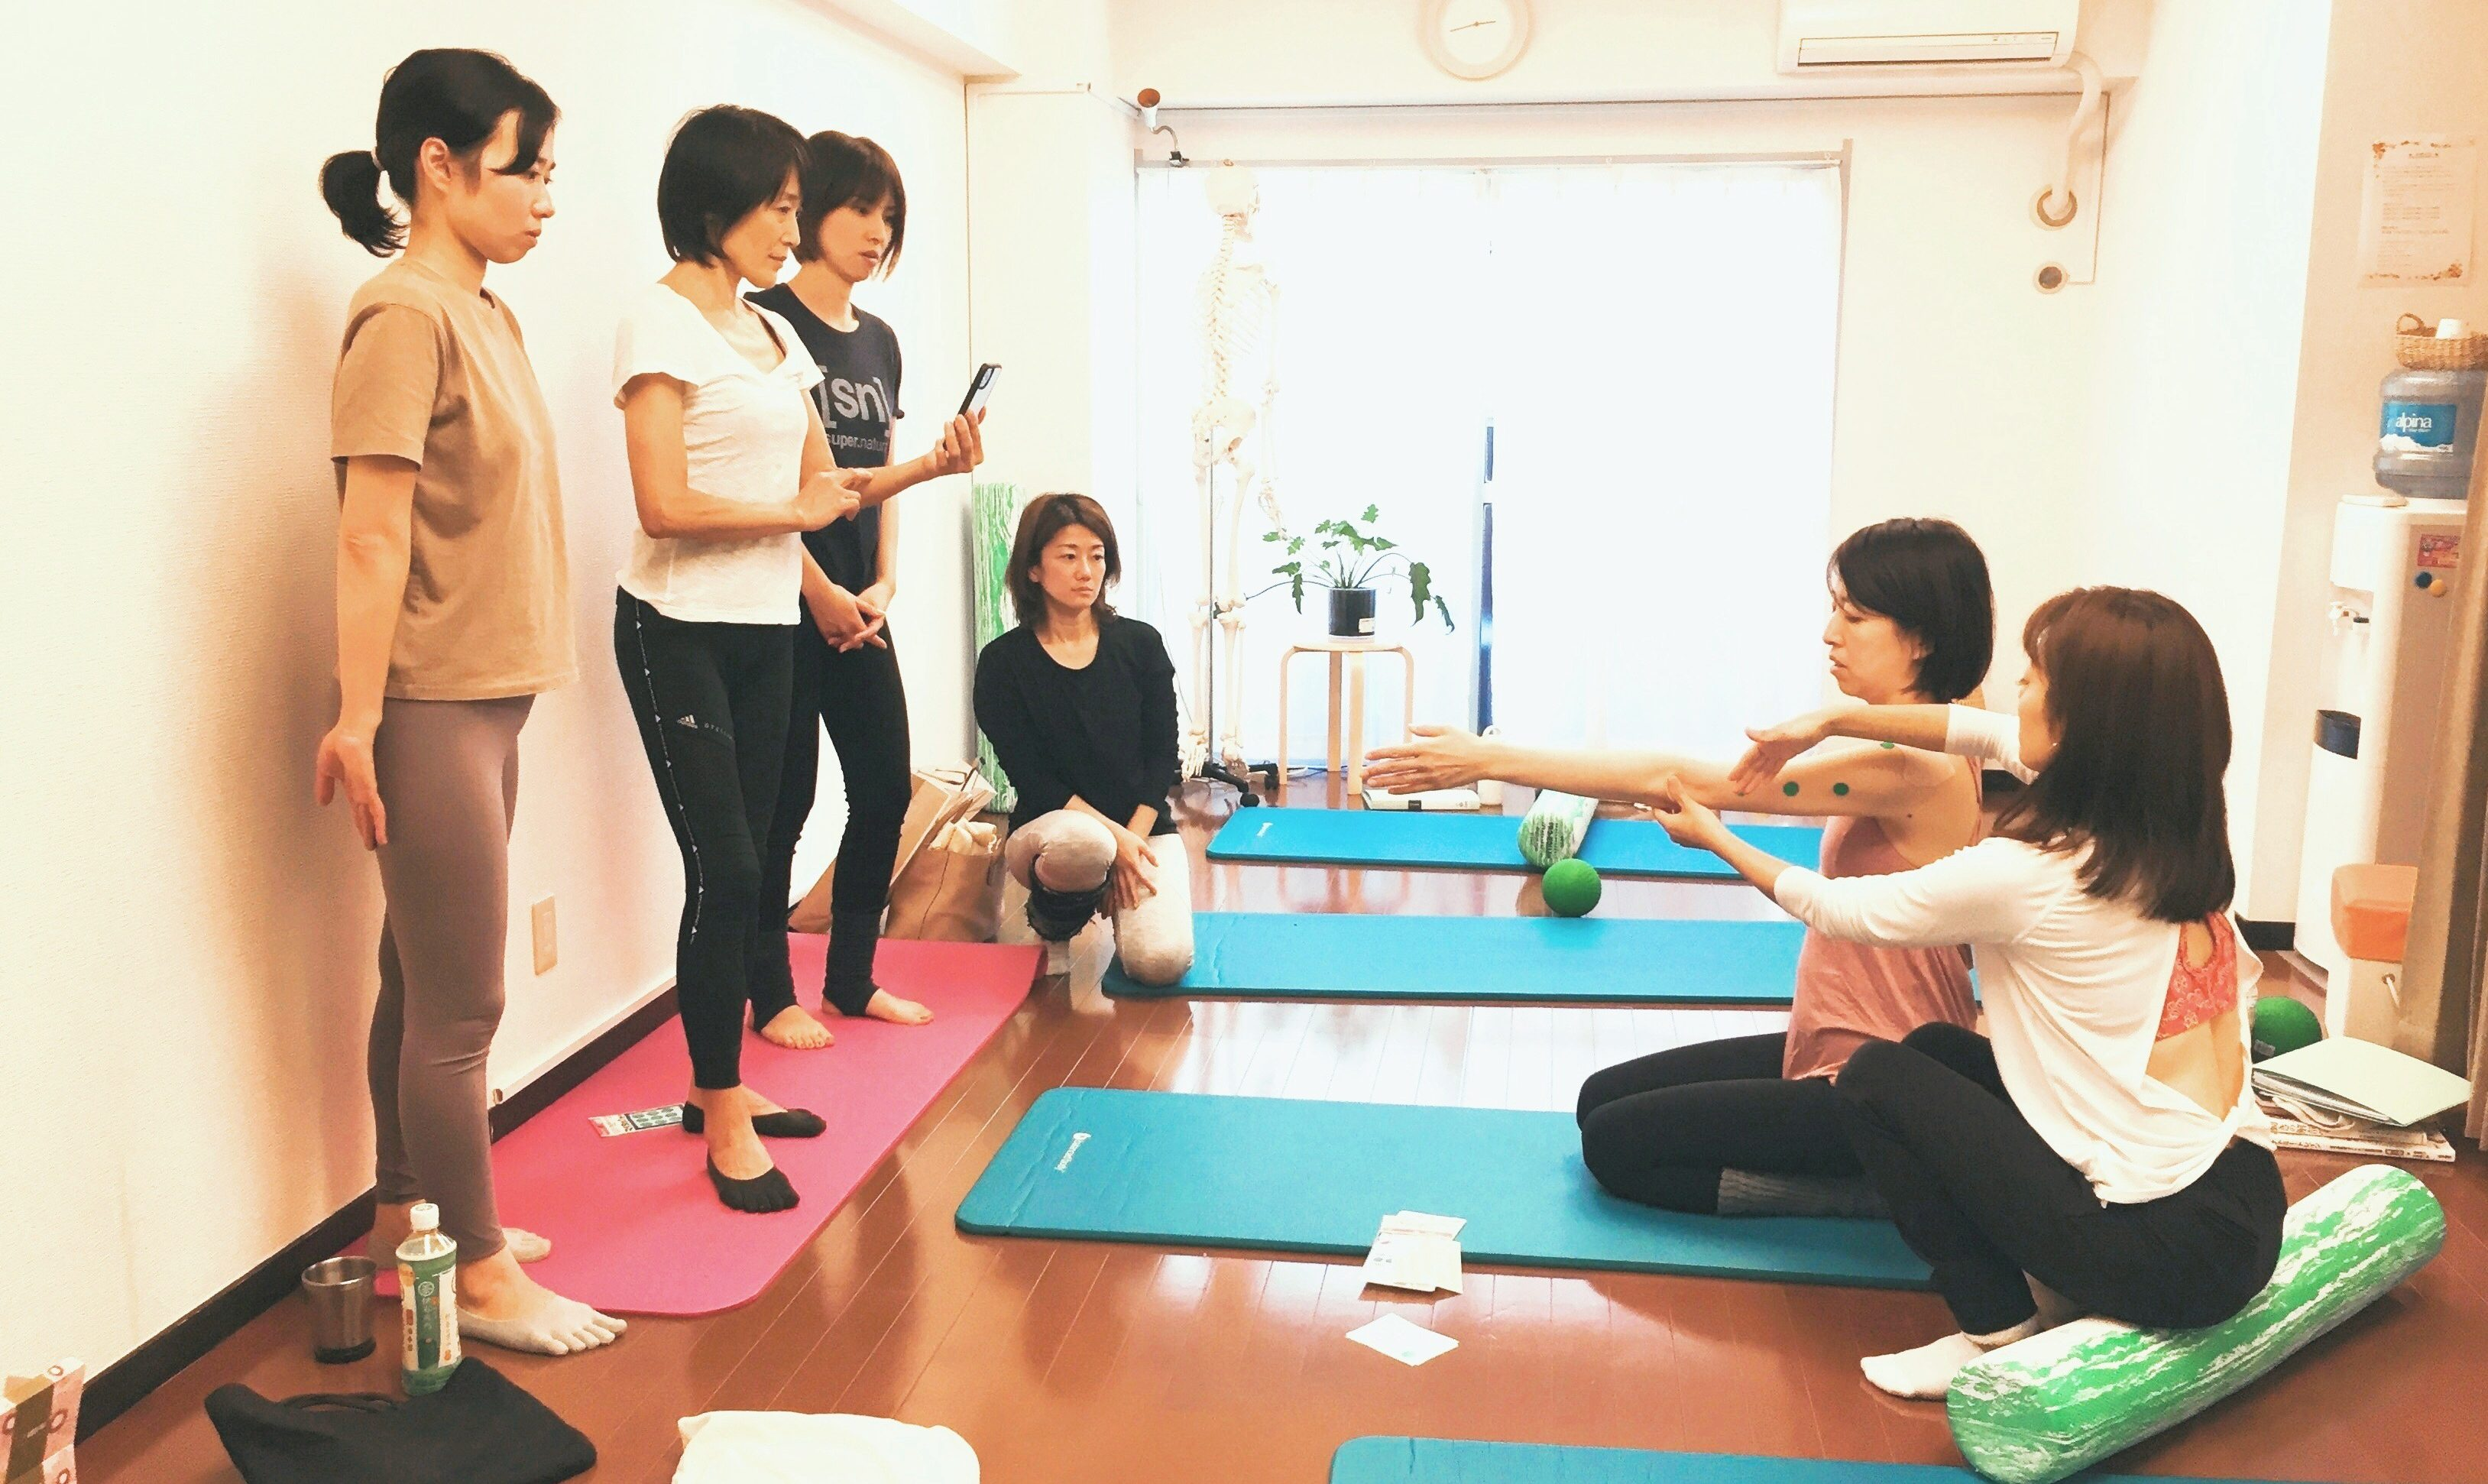 【Kayoko's blog】ベーシックマット東京養成コース開催中です♪